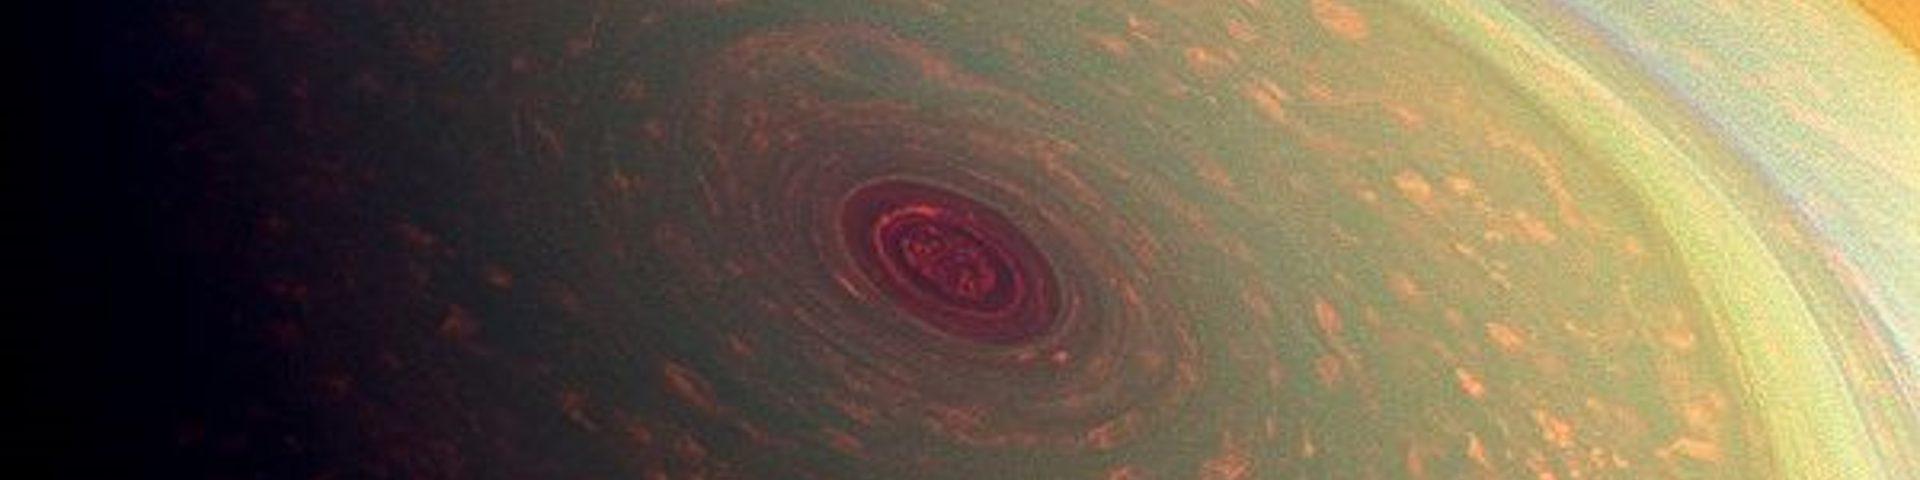 Hexágono de Saturno en falso color para resaltar las tormentas tomada por Cassini (NASA 2013) como portada de Un hexágono polar: ULÛM